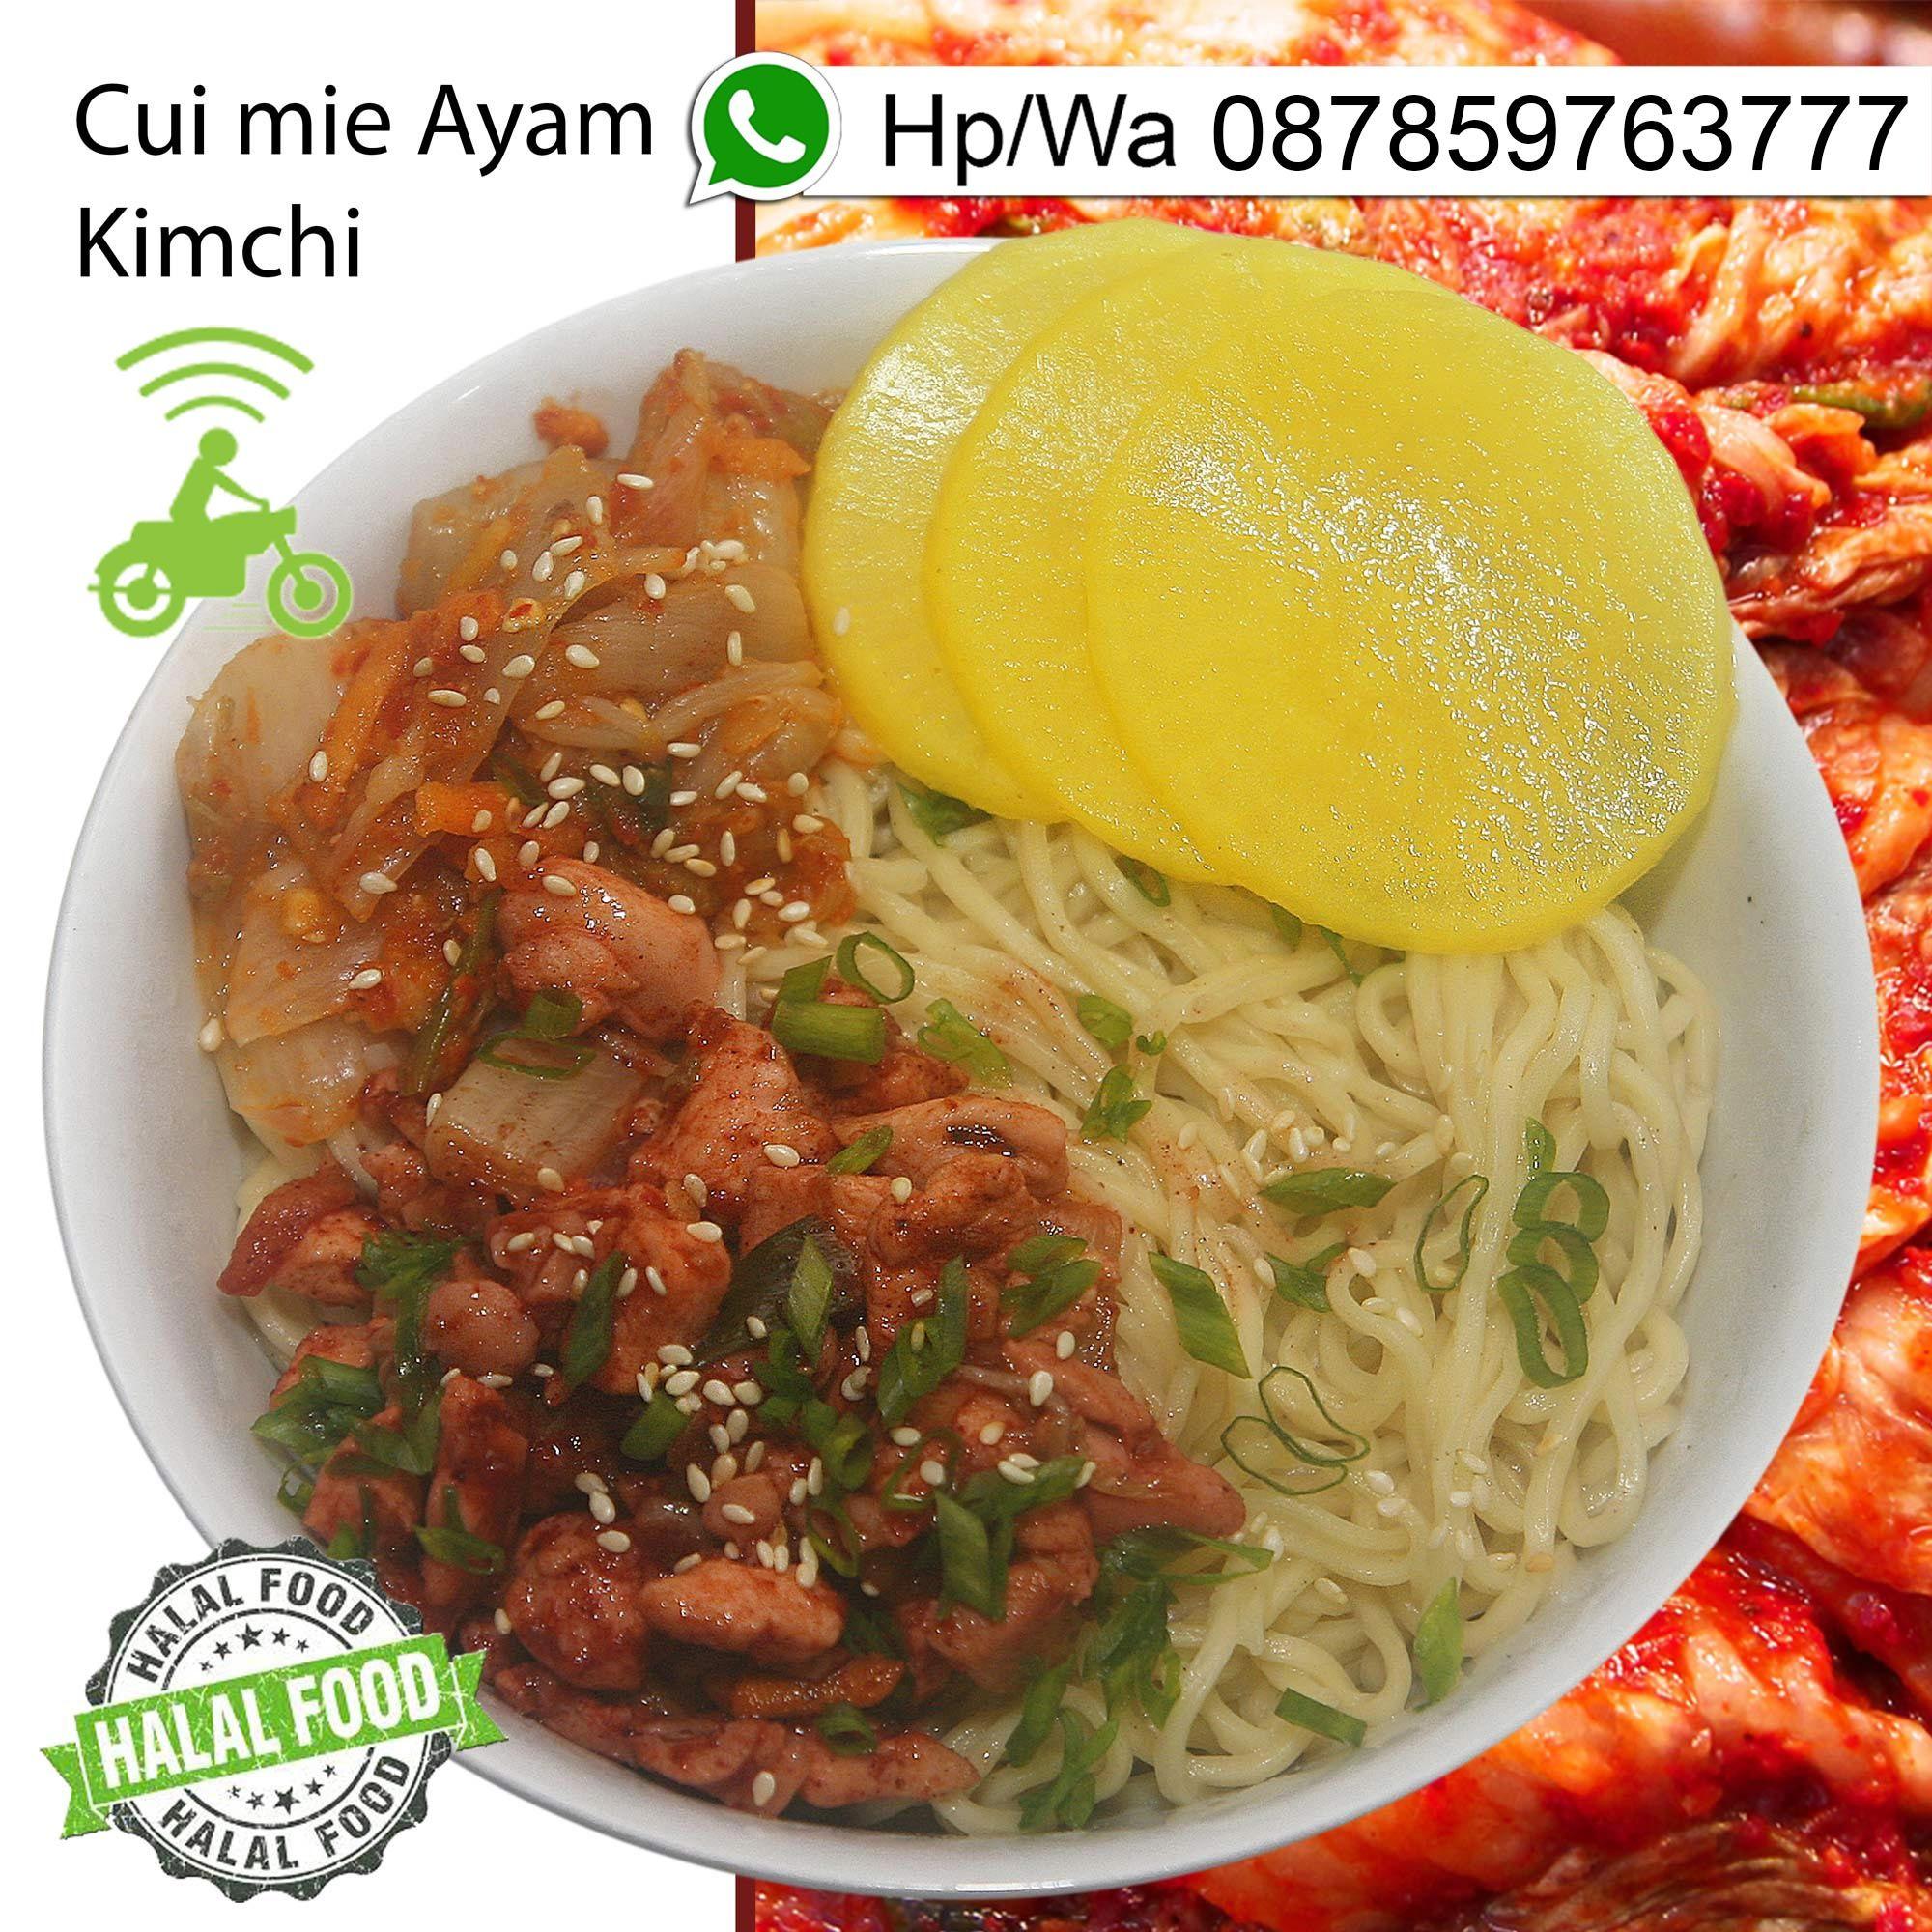 Makanan Unik Hp Wa 62 851 0080 8796 Unik Dan Enak Tempat Makan